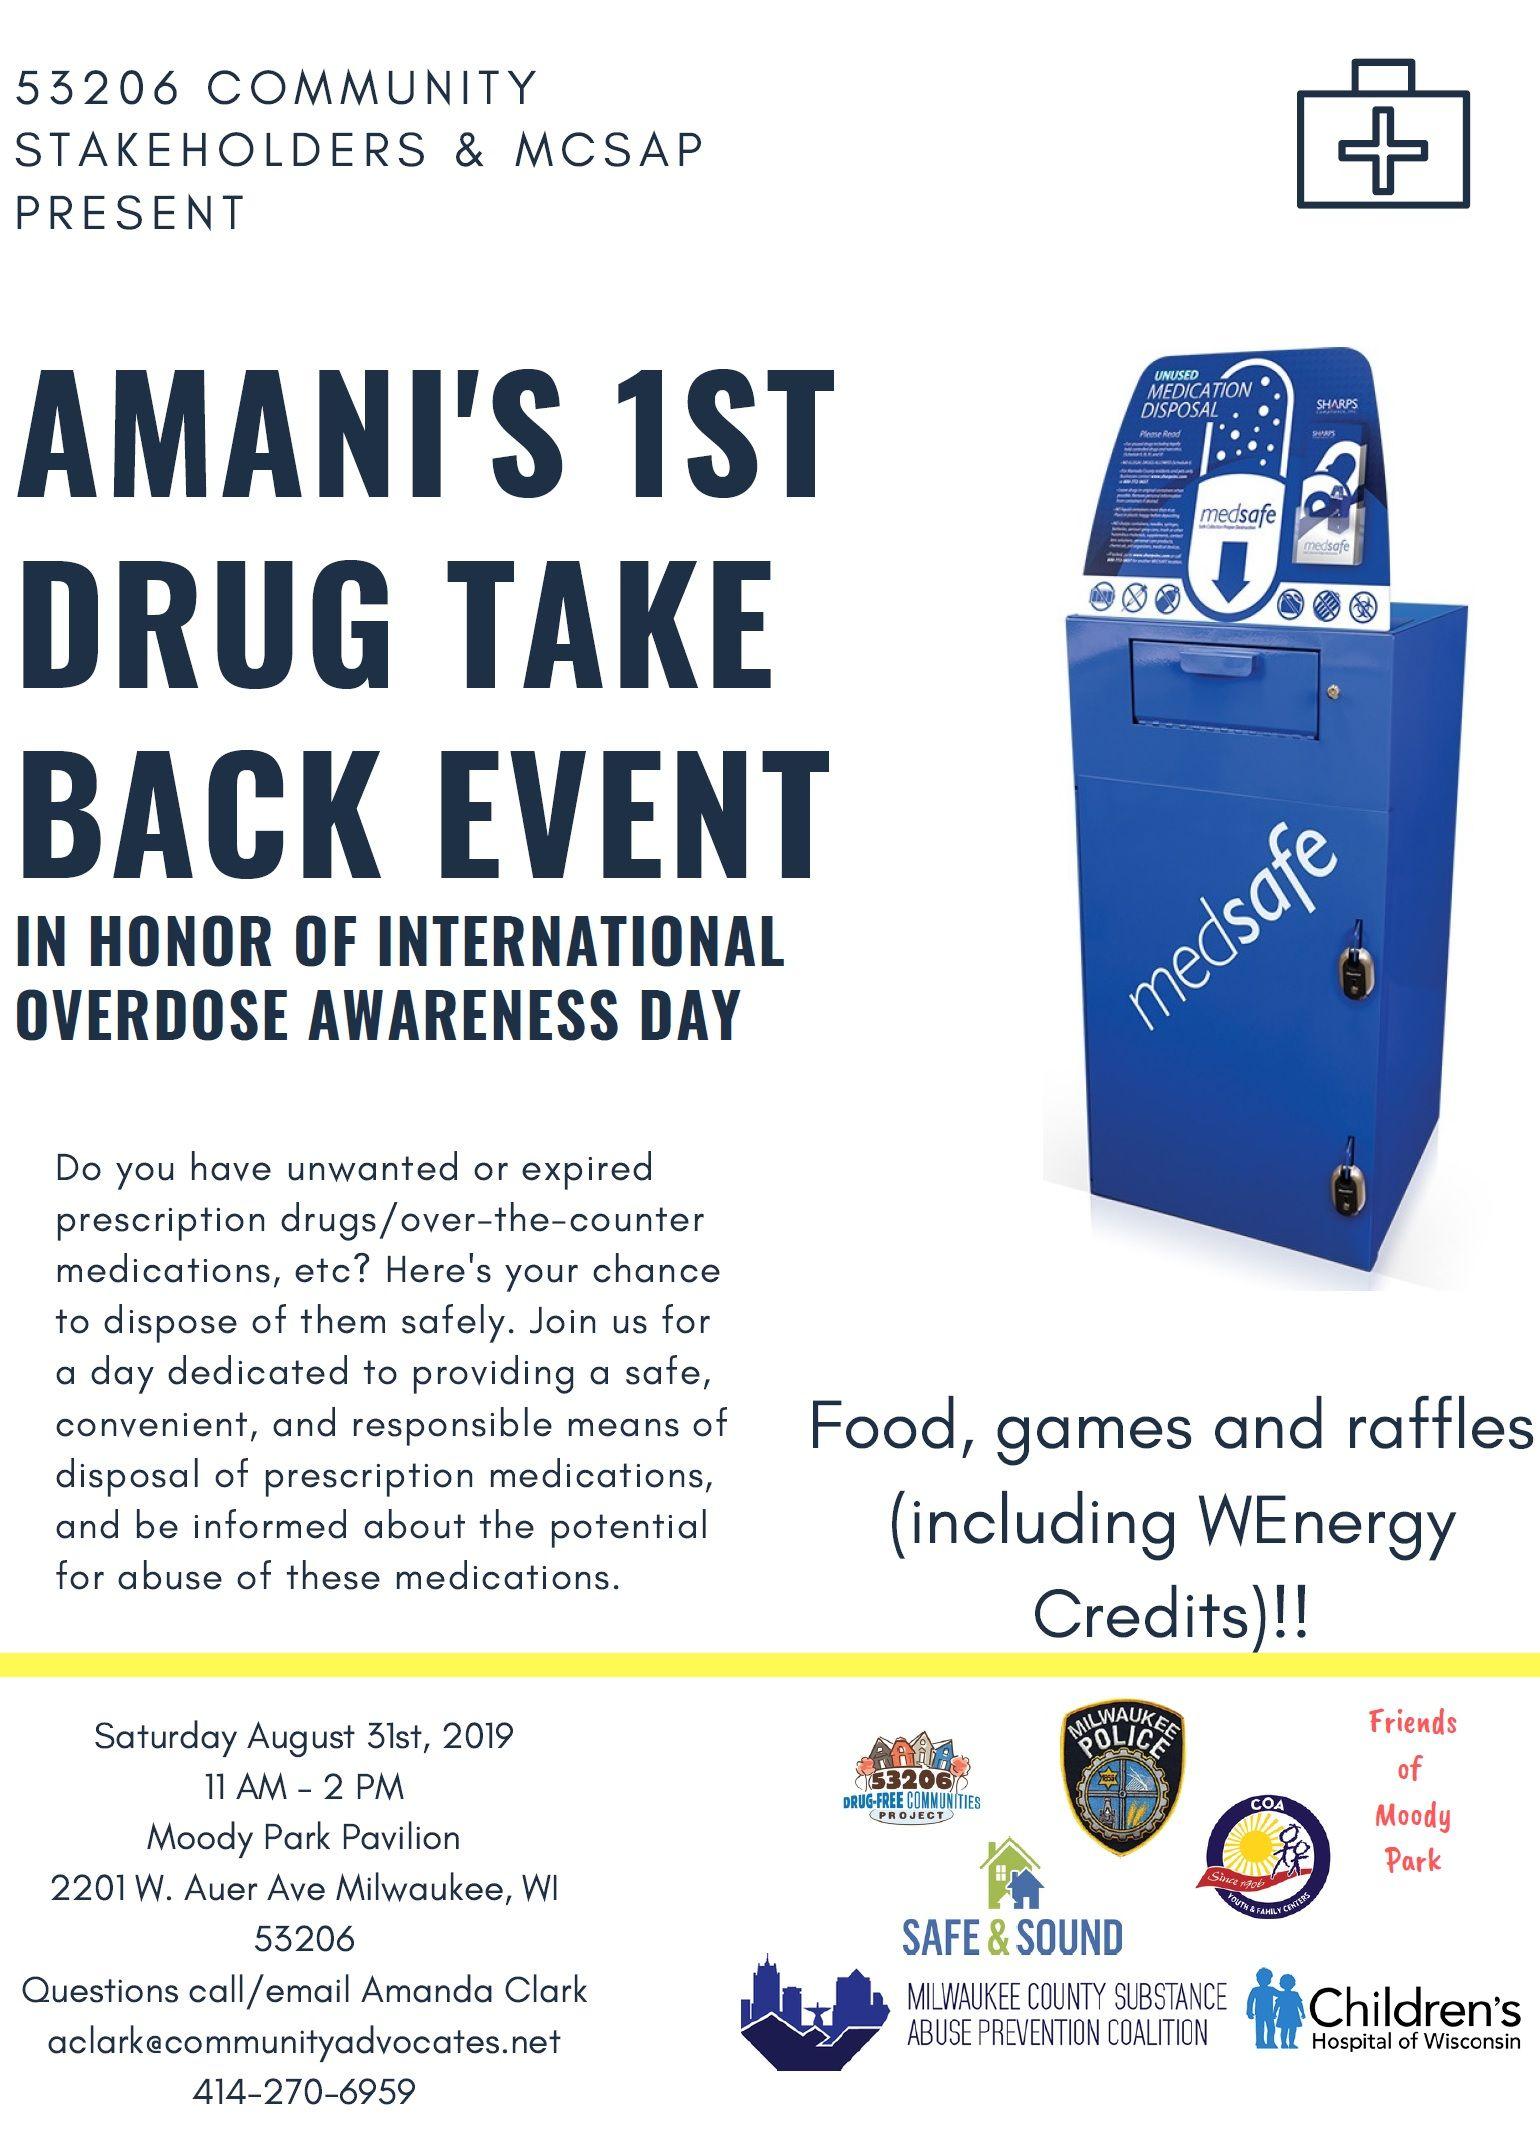 International Overdose Awareness Day Drug Take-Back Event in Amani